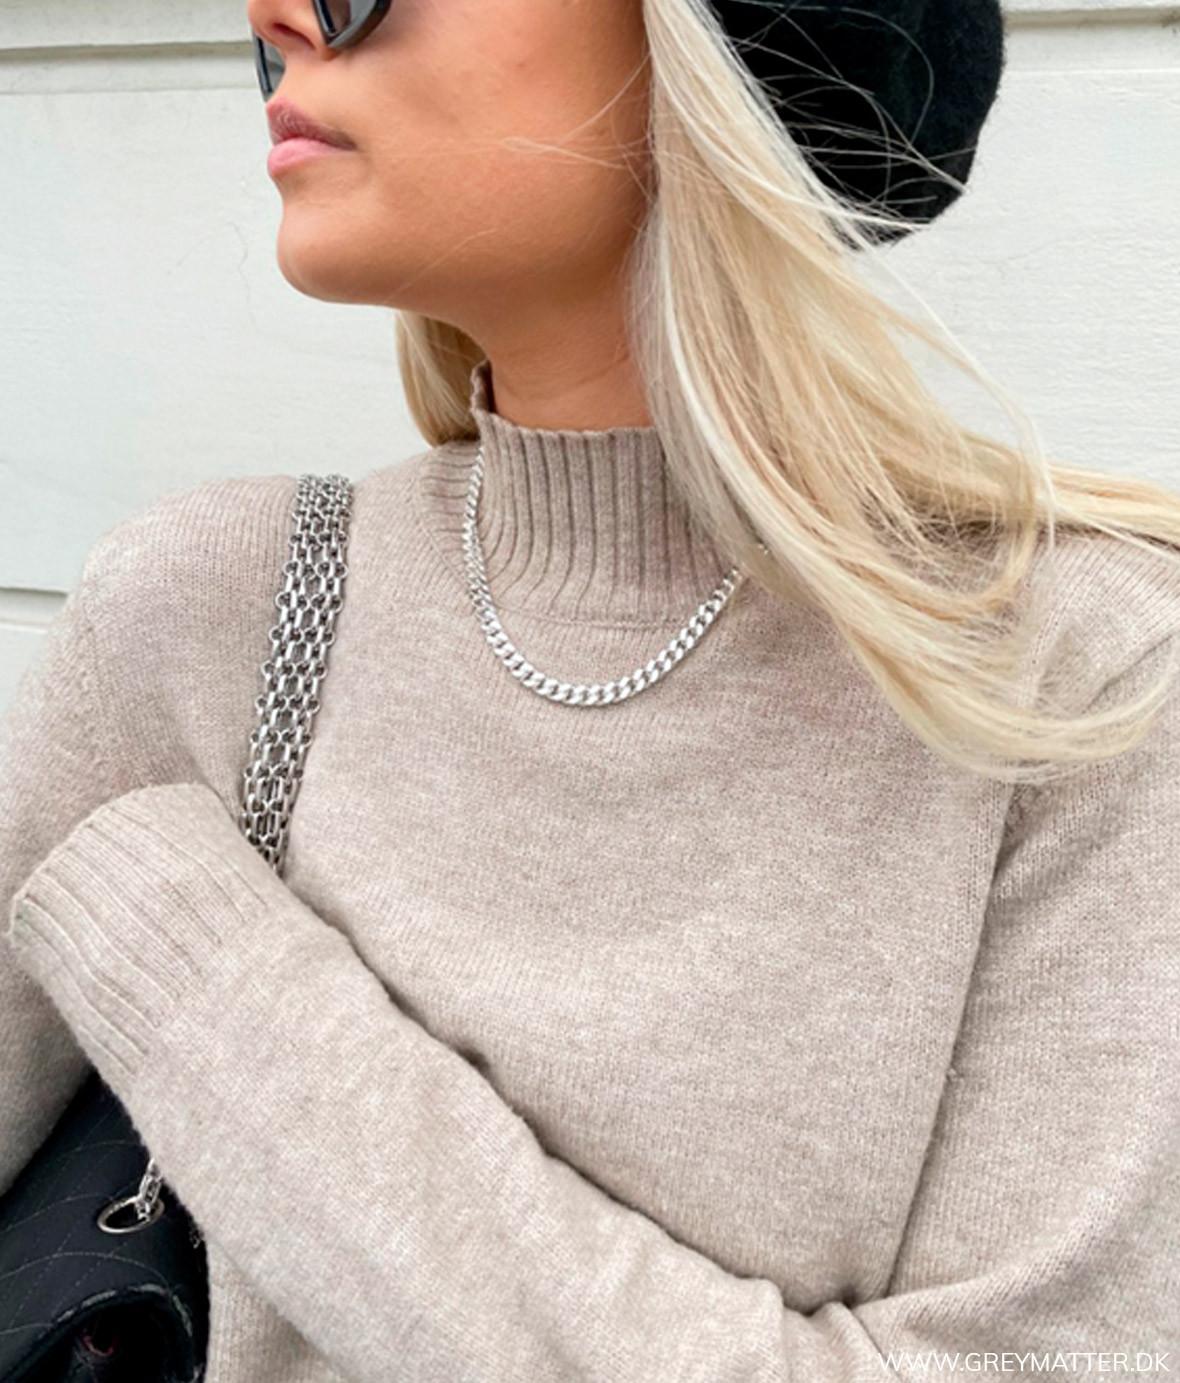 greymatter_fashion_turtleneck_blouse.jpg